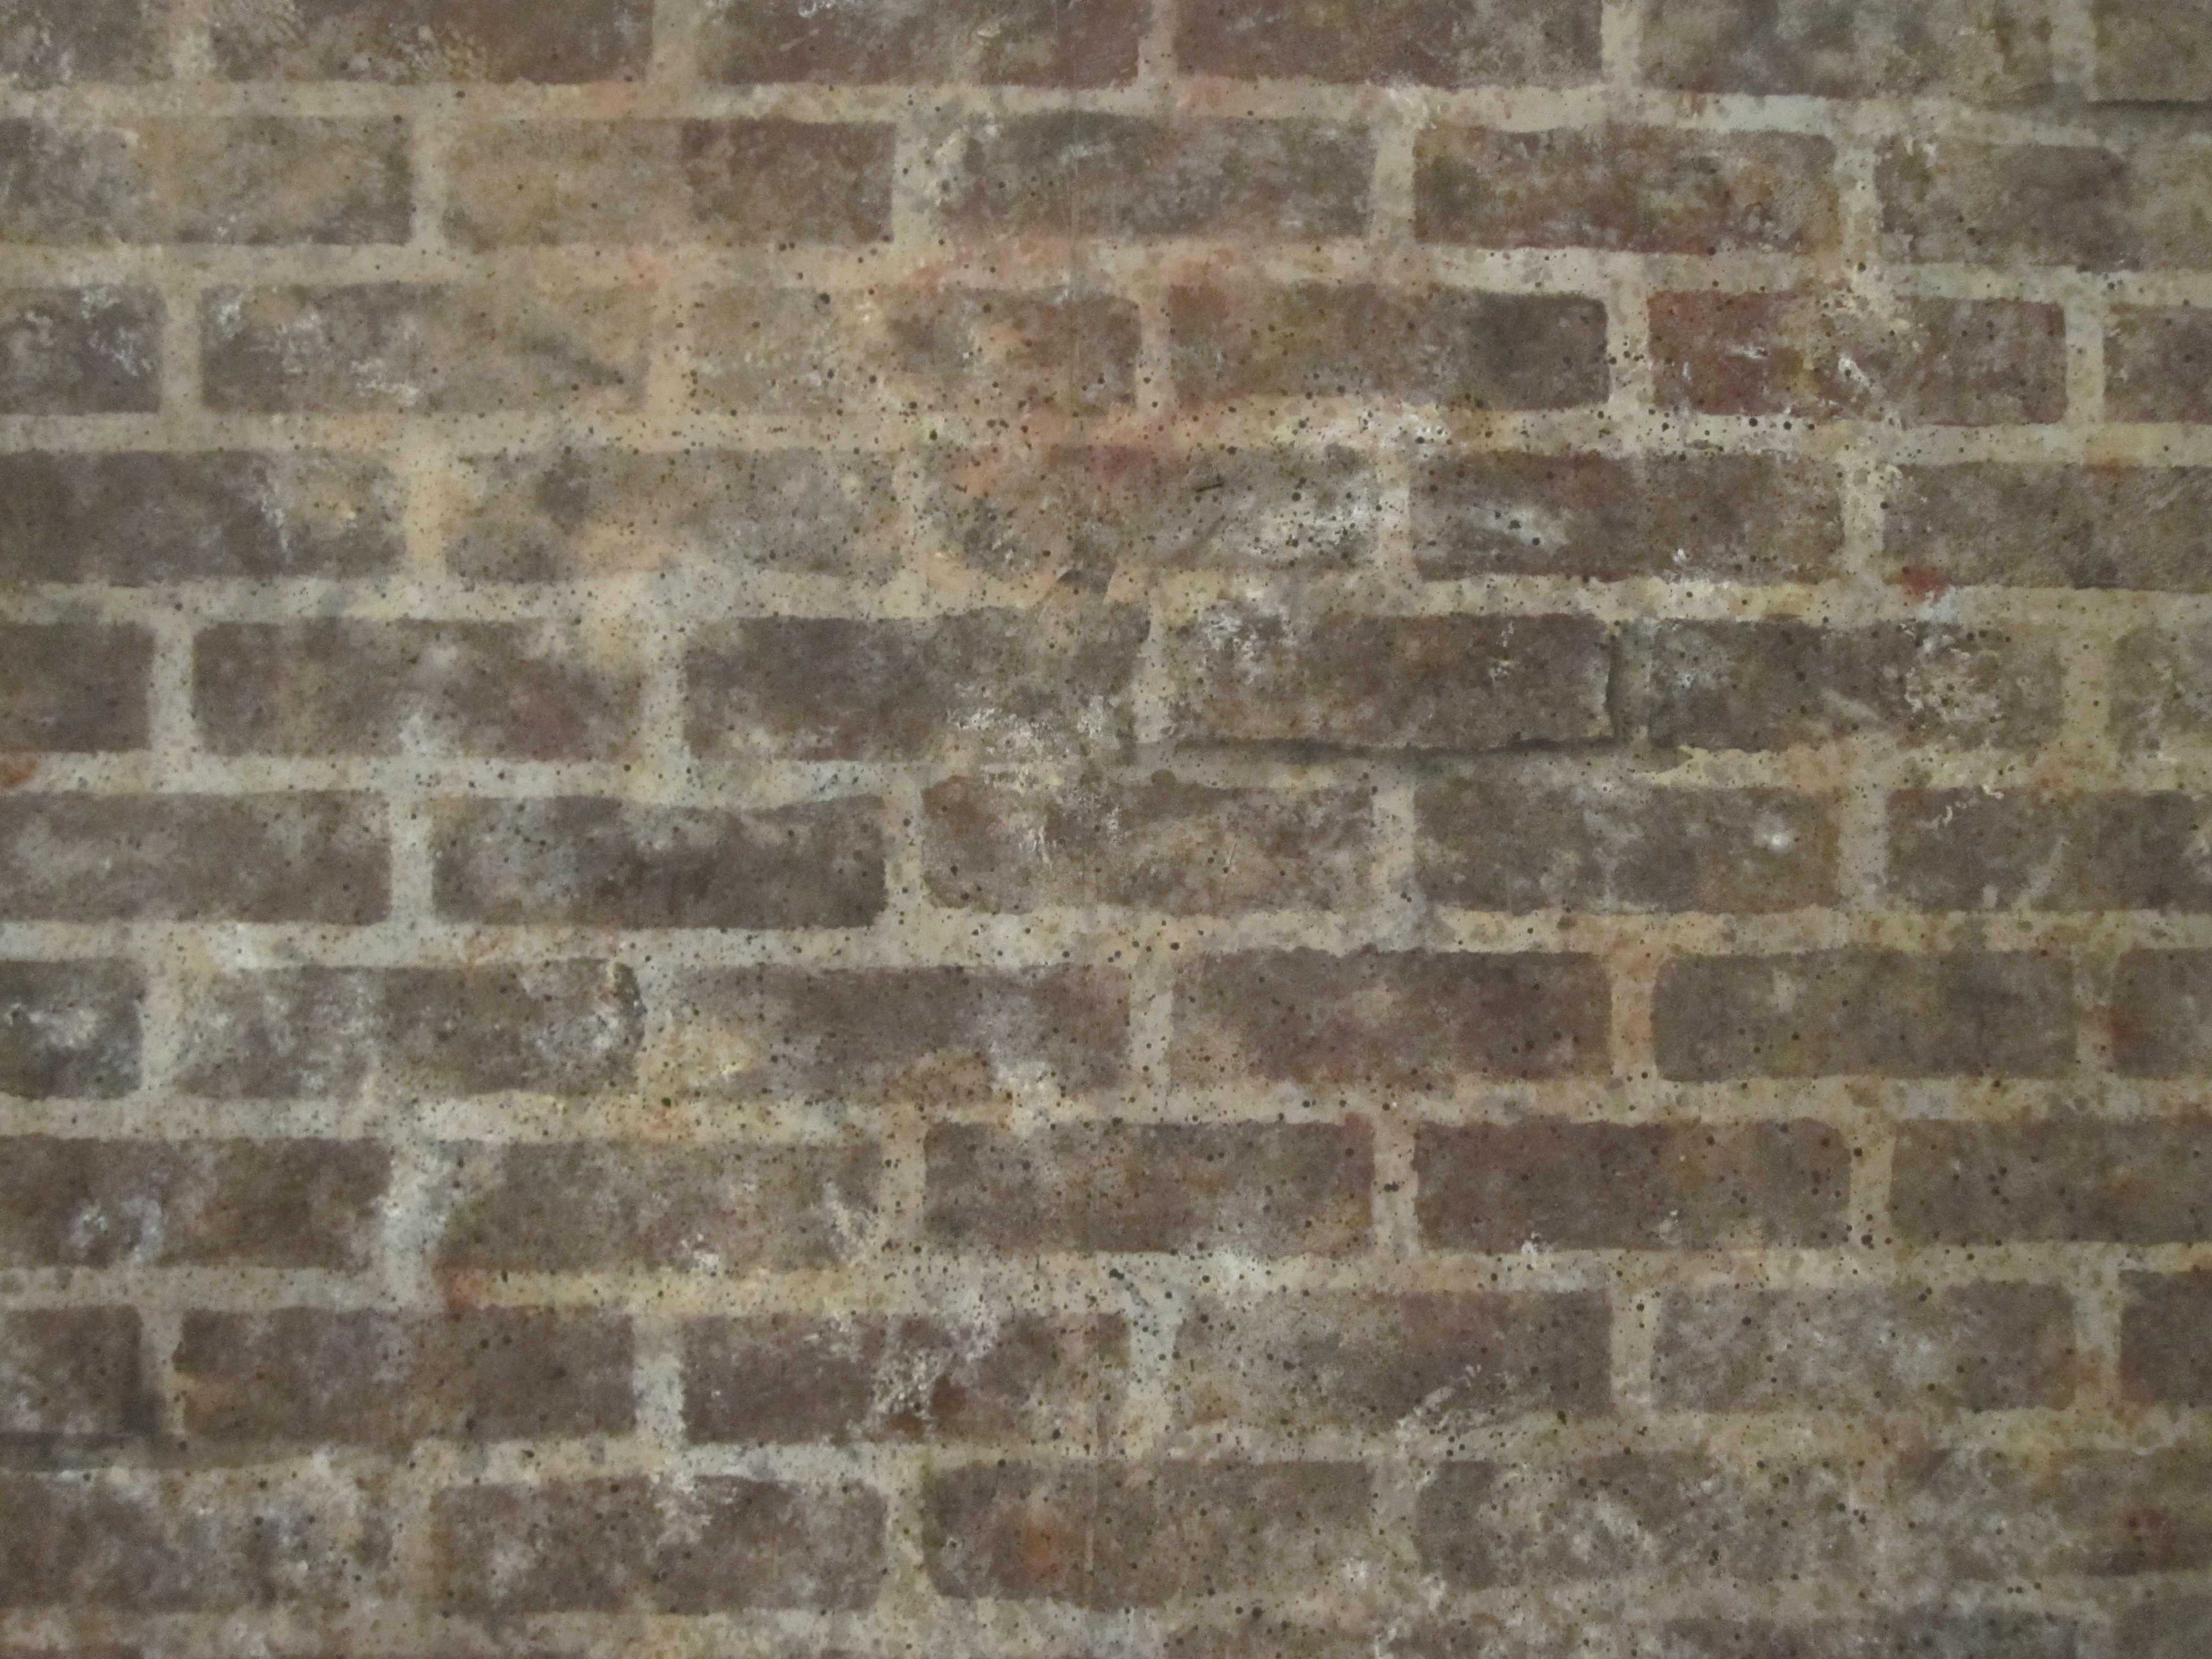 wallpaper faux brick   wwwhigh definition wallpapercom 4000x3000